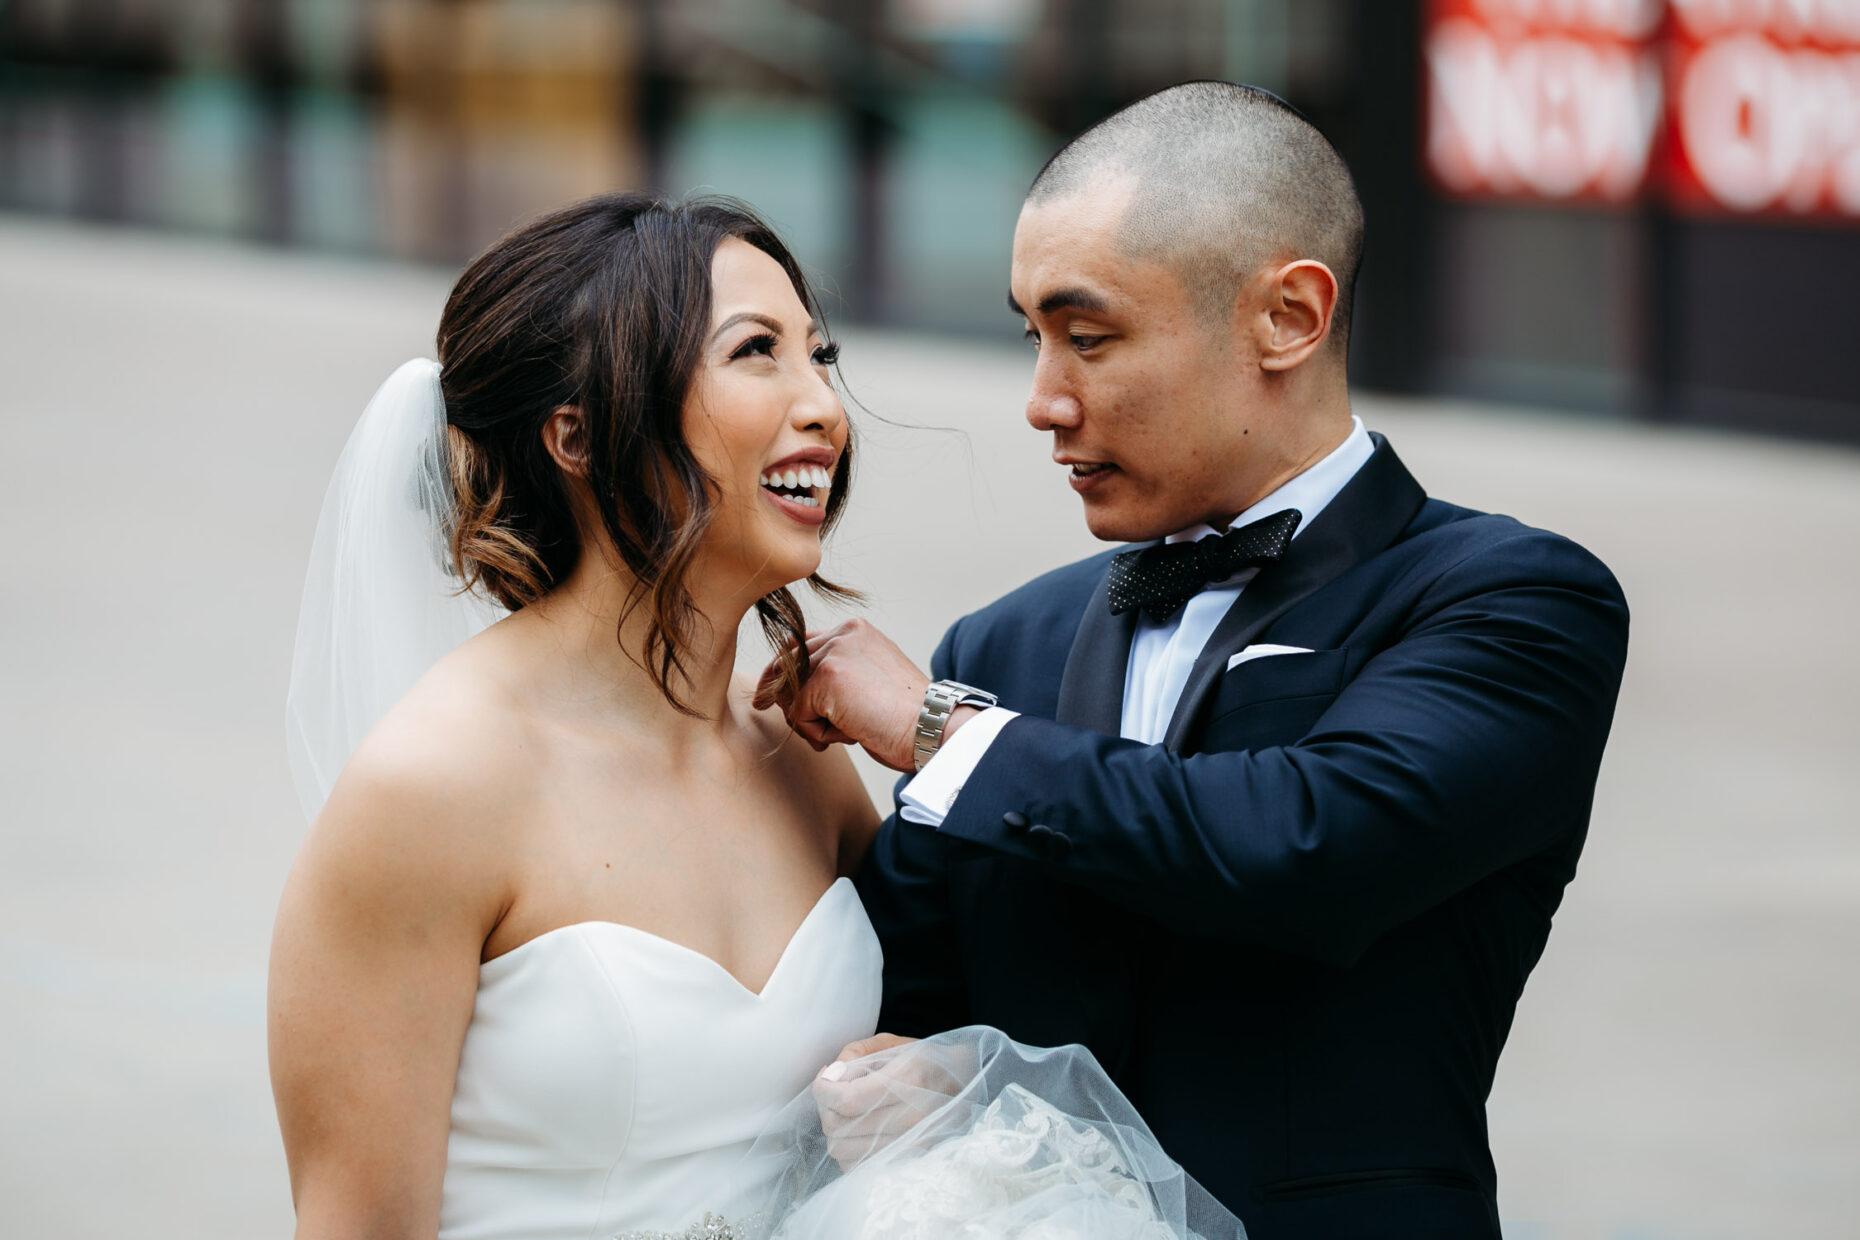 Sacramento wedding photographer documenting organic moments between couples